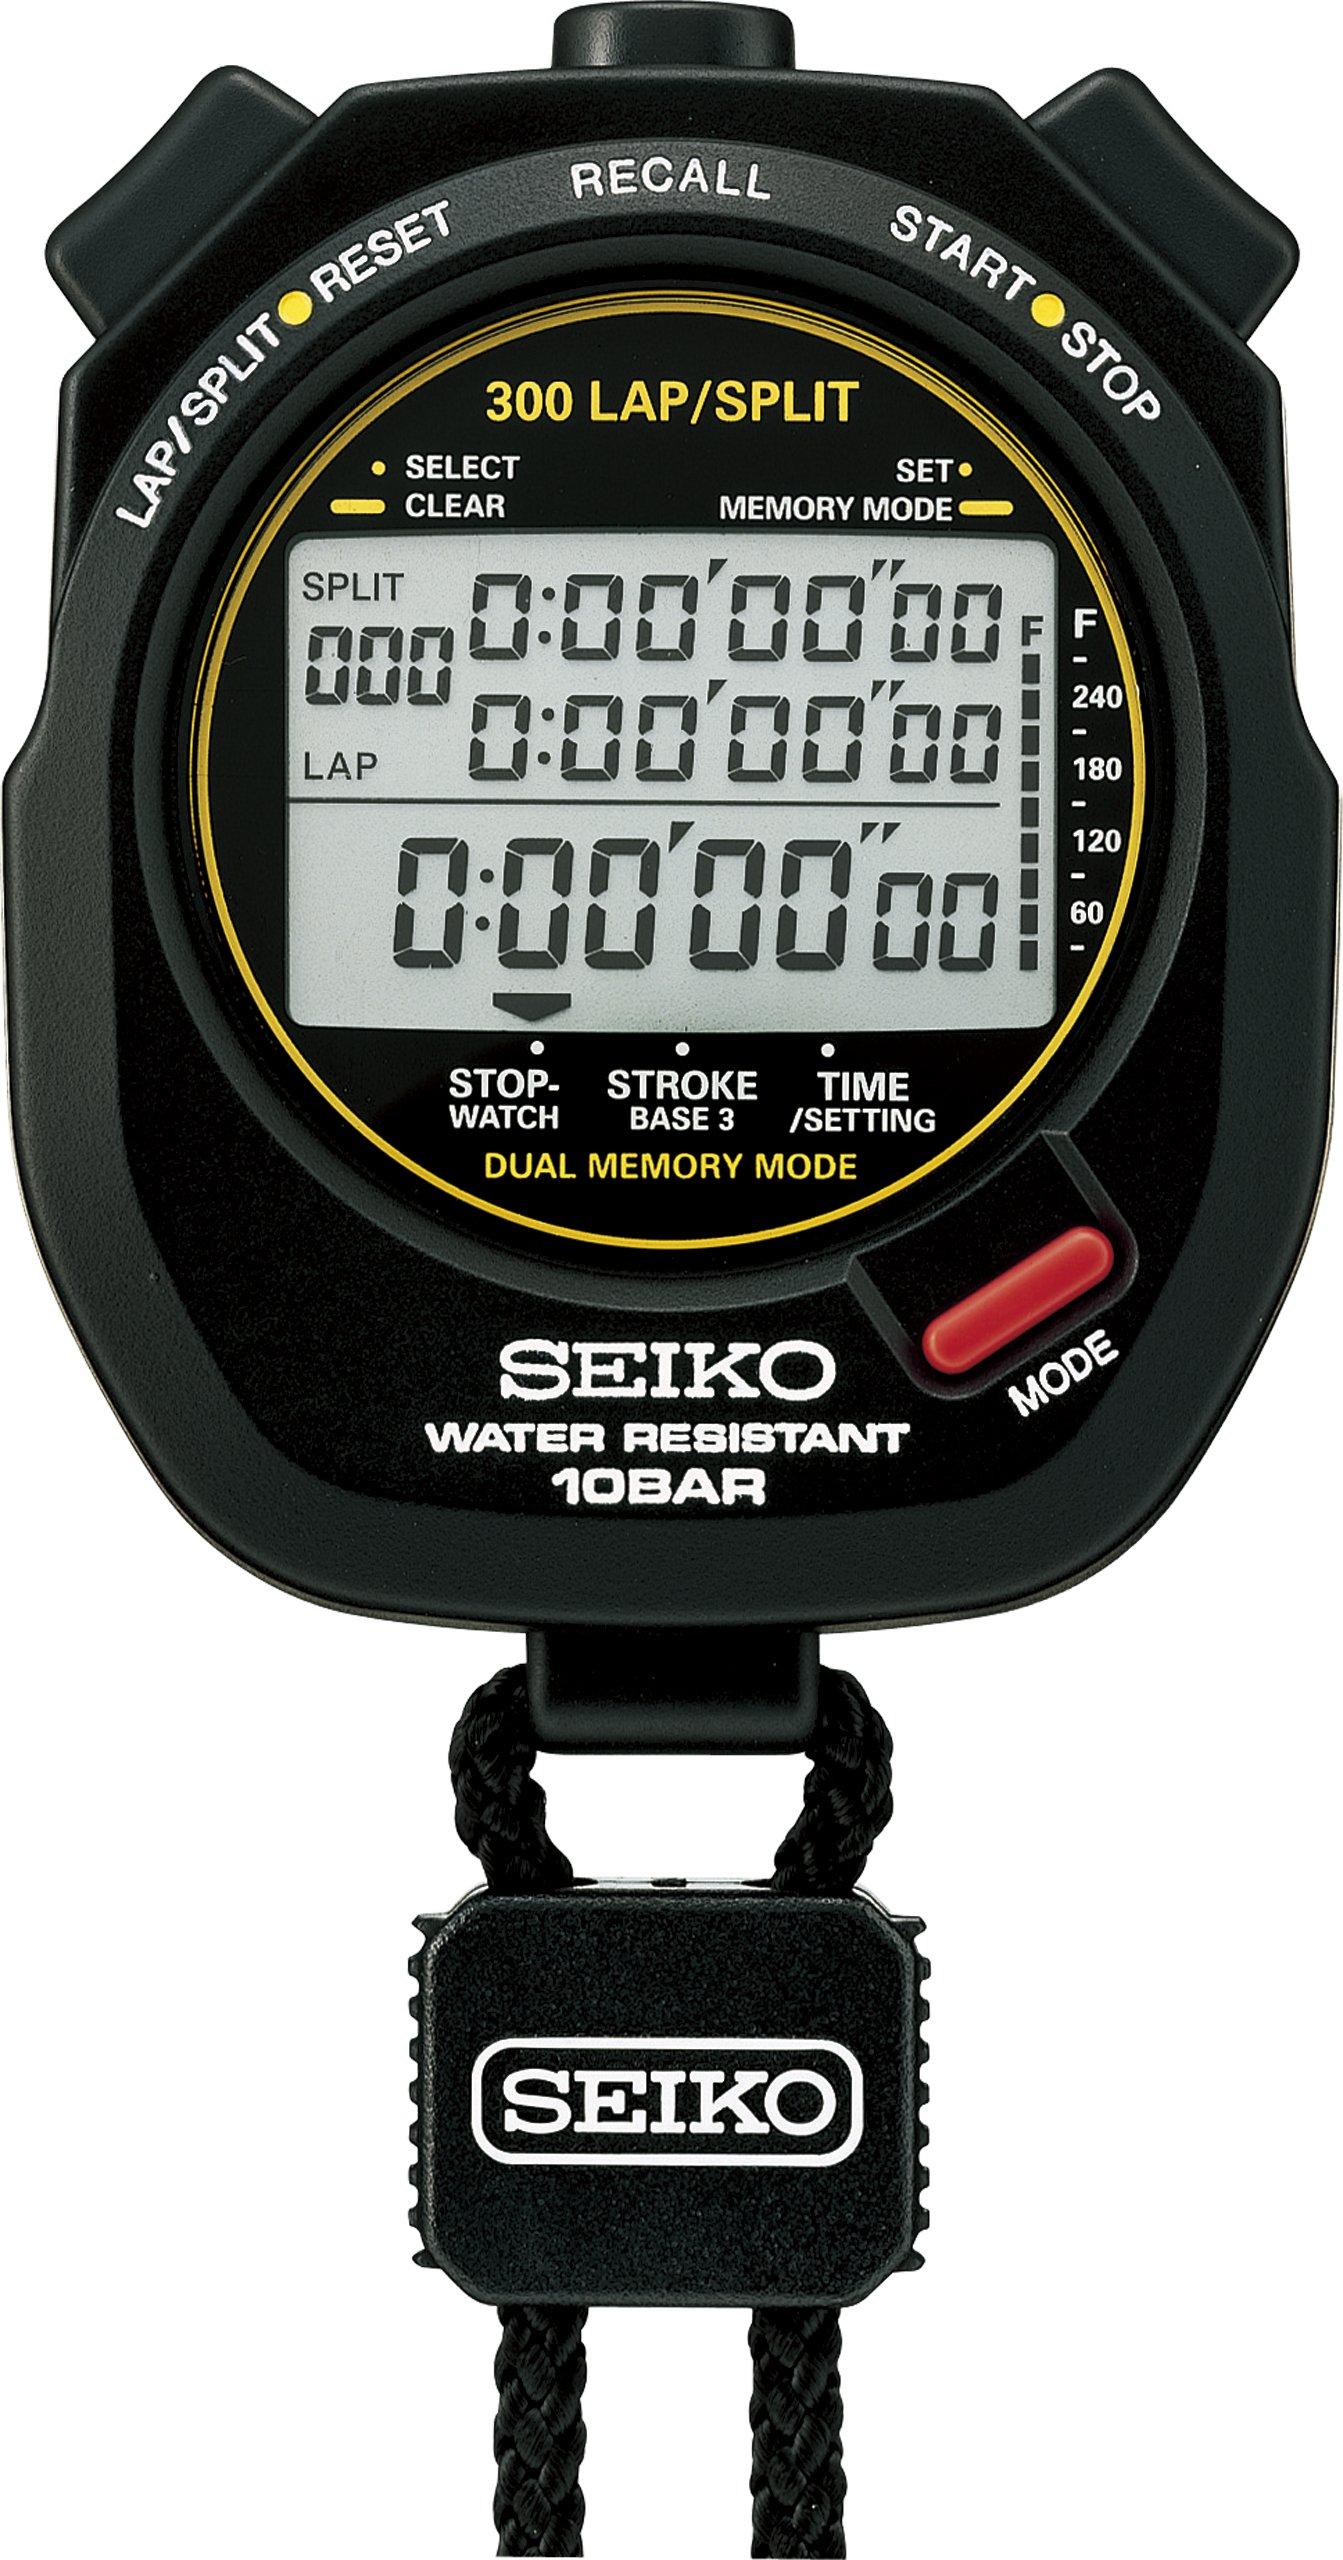 SEIKO SVAS003 Swimming Master Stopwatch by Seiko